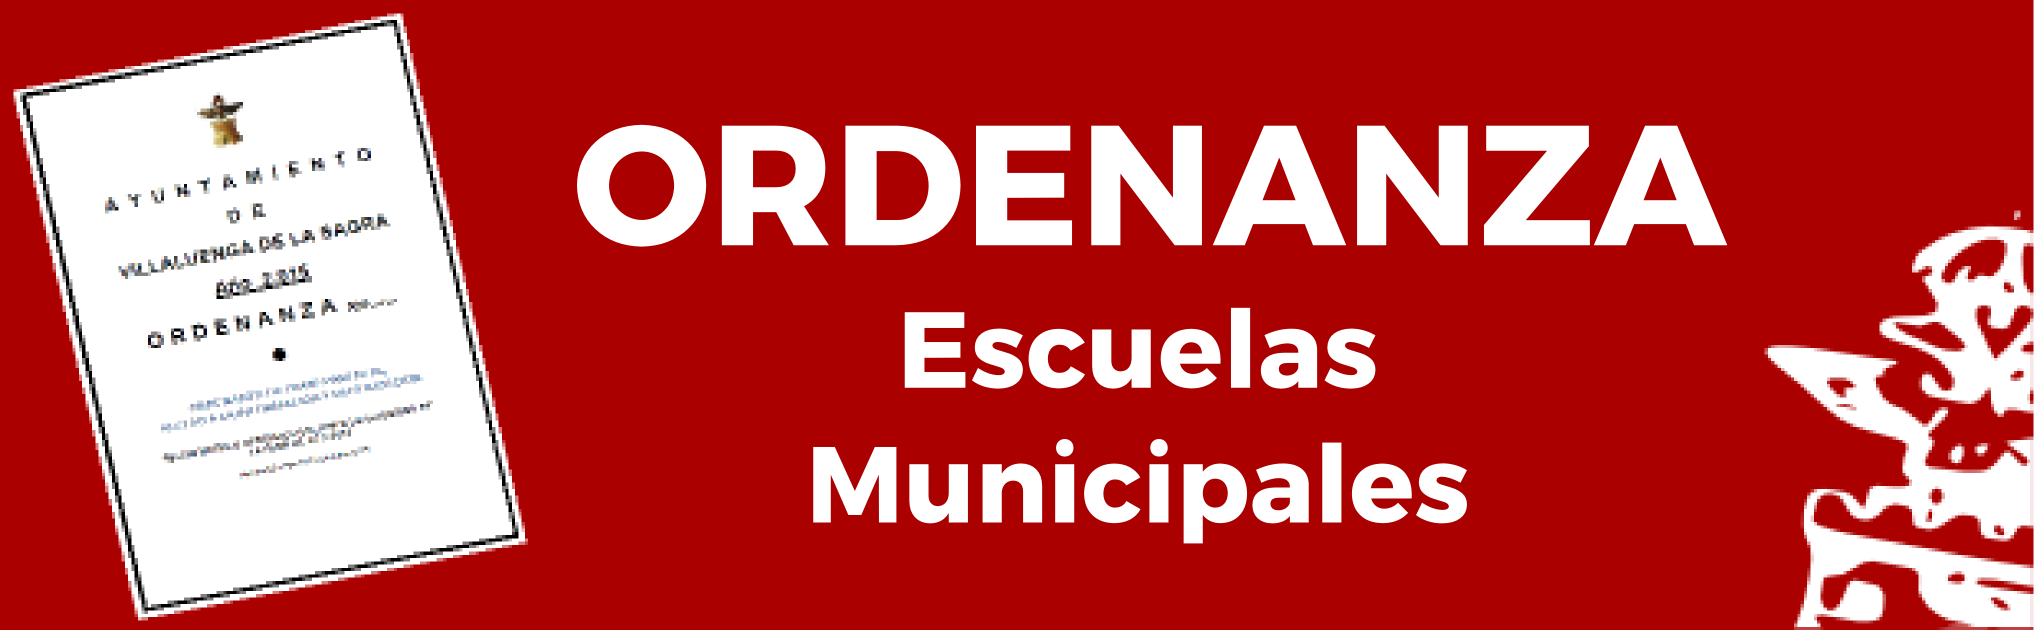 Escuela Municipal de Gimnasia | Ayto Villaluenga de la Sagra